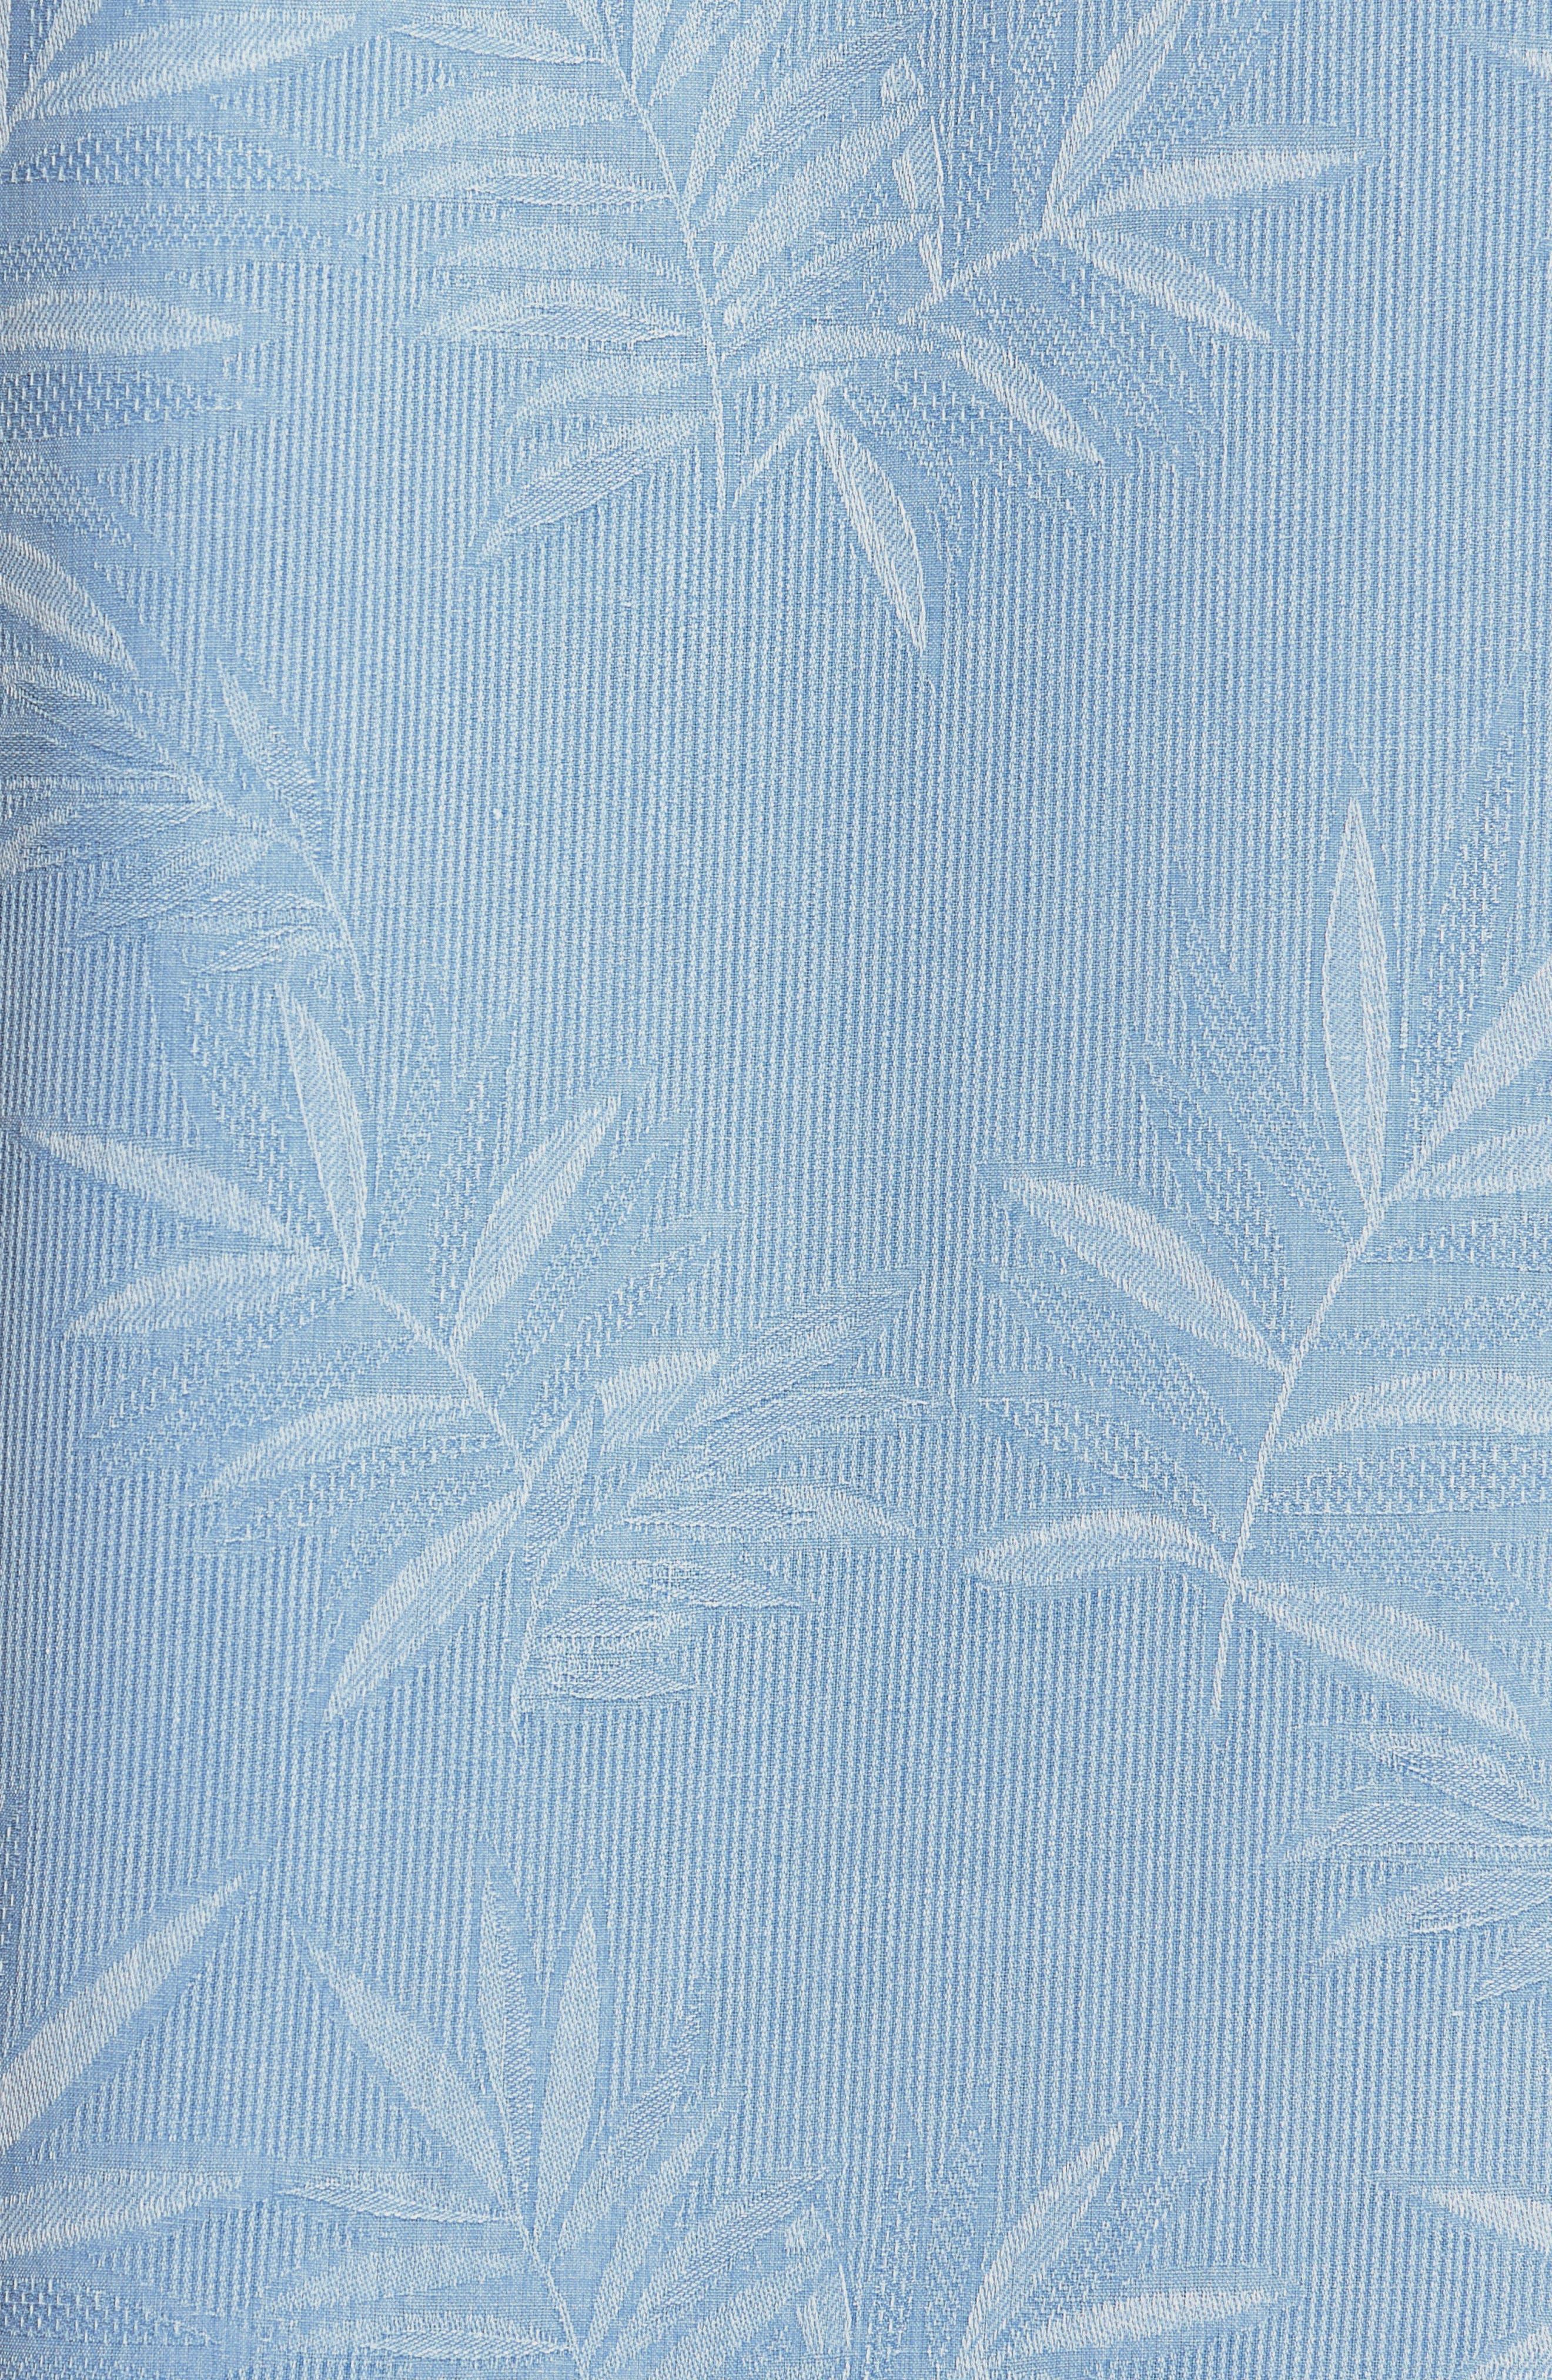 TOMMY BAHAMA,                             Luau Floral Silk Shirt,                             Alternate thumbnail 5, color,                             408